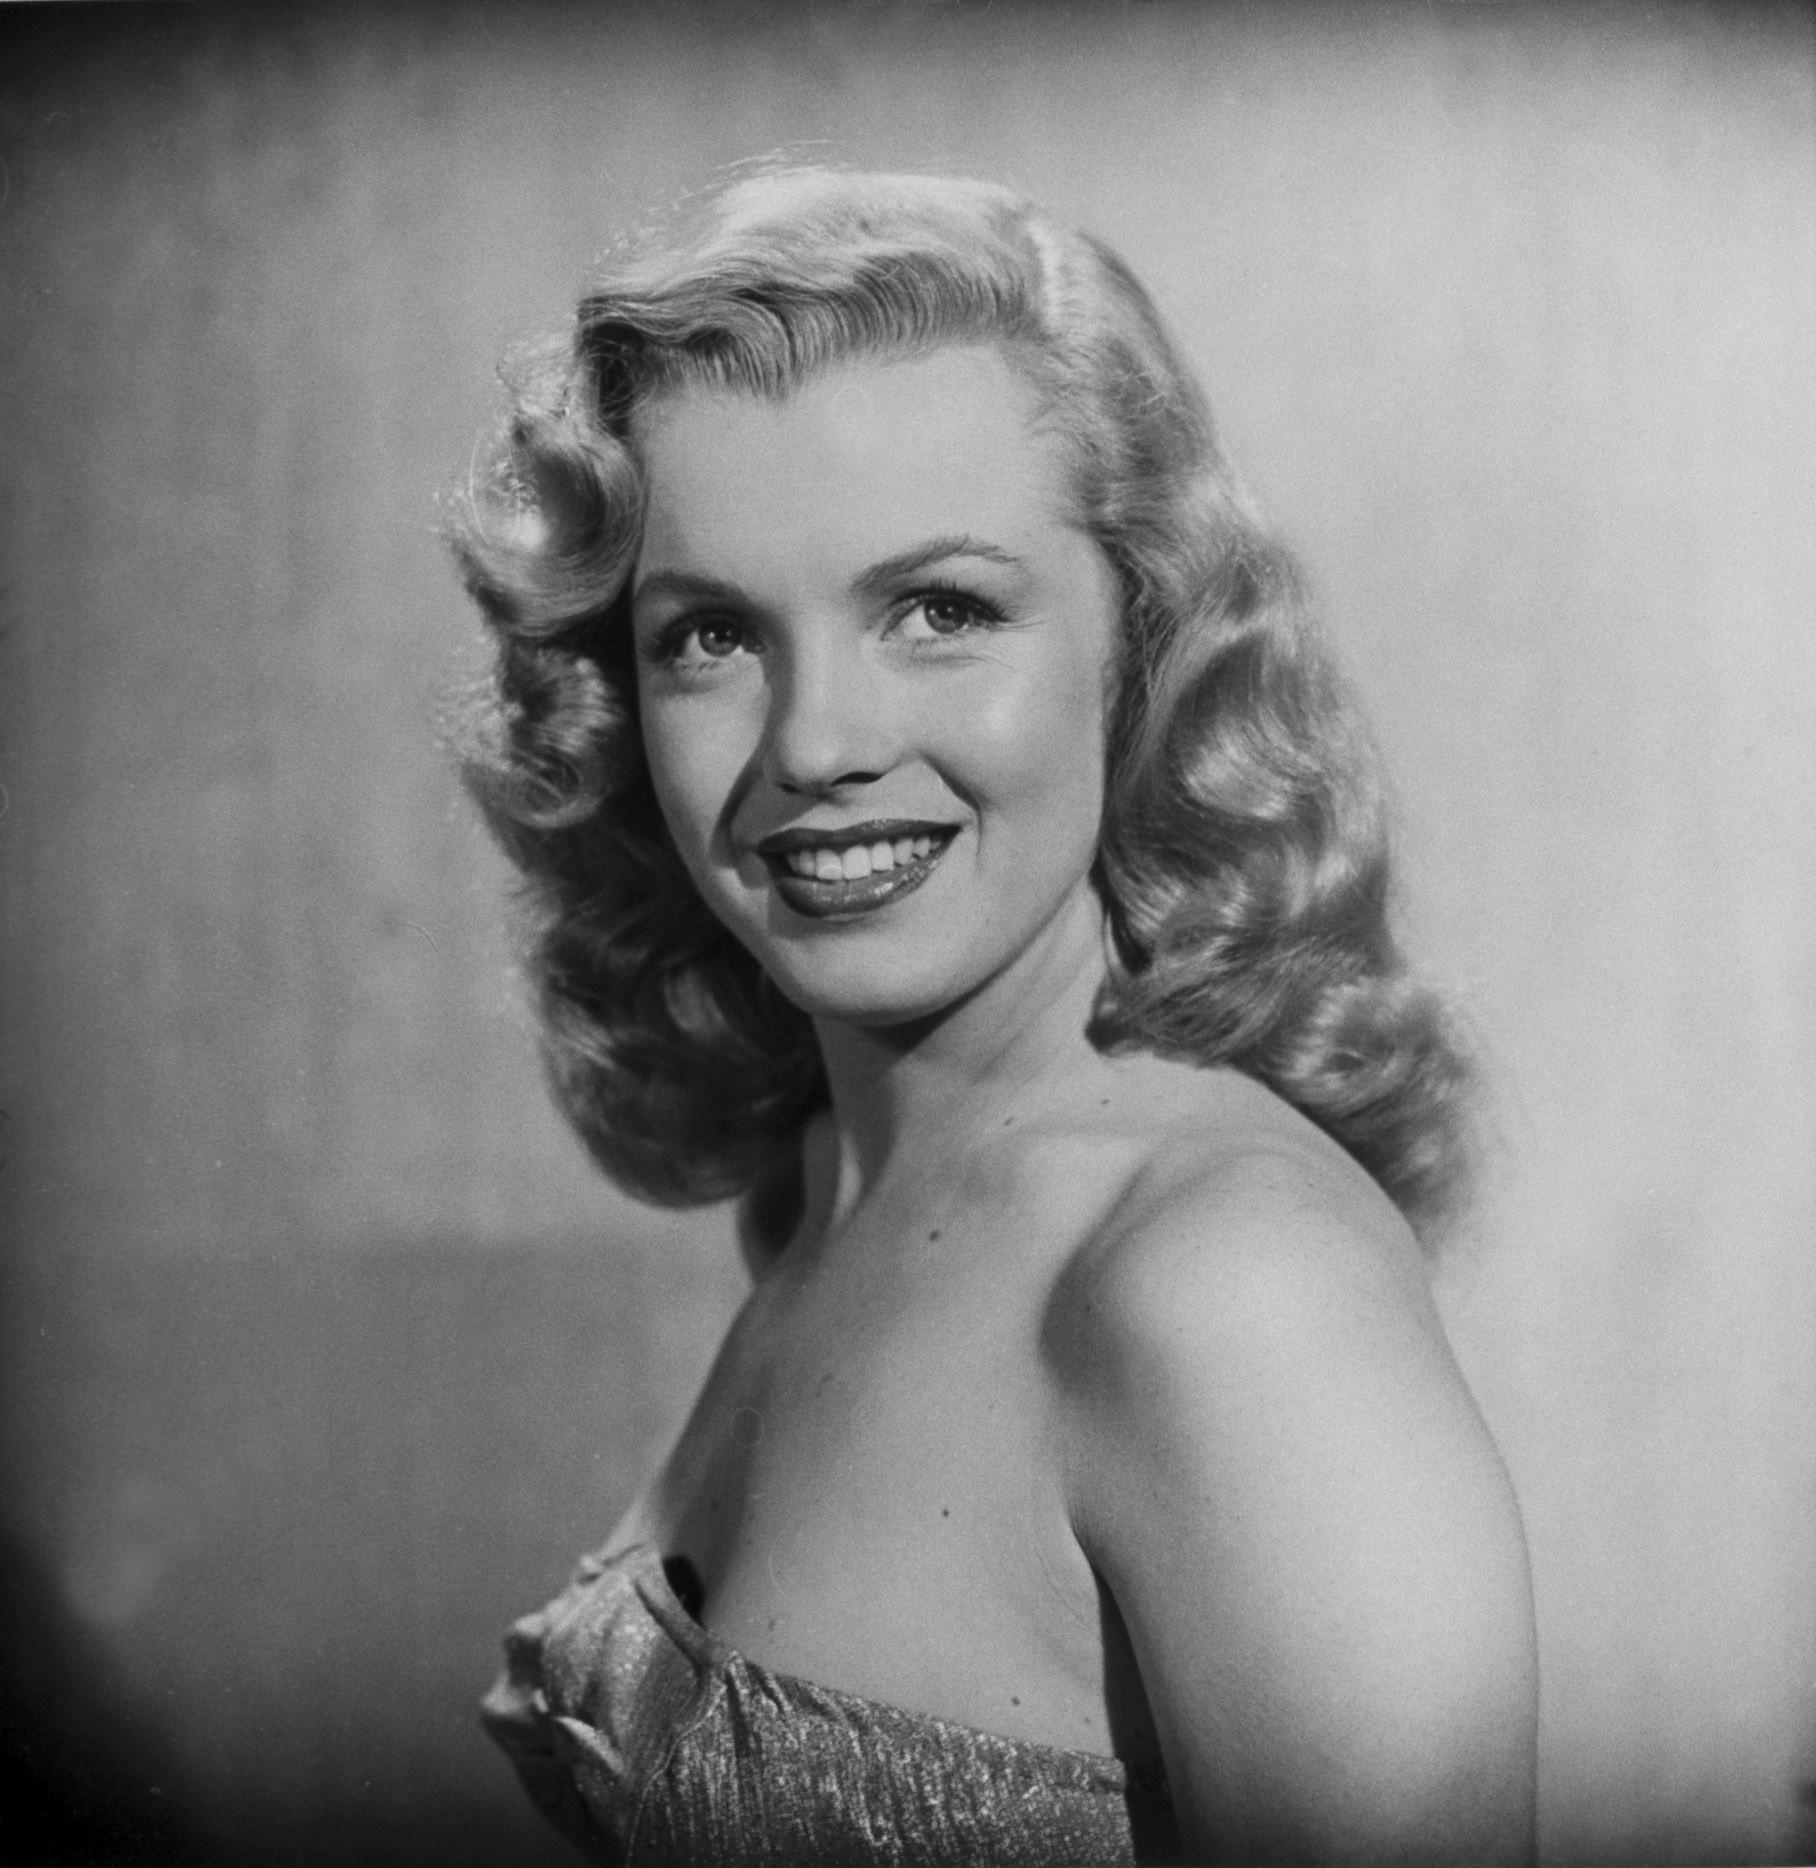 Marilyn Monroe posing in a studio, 1949.